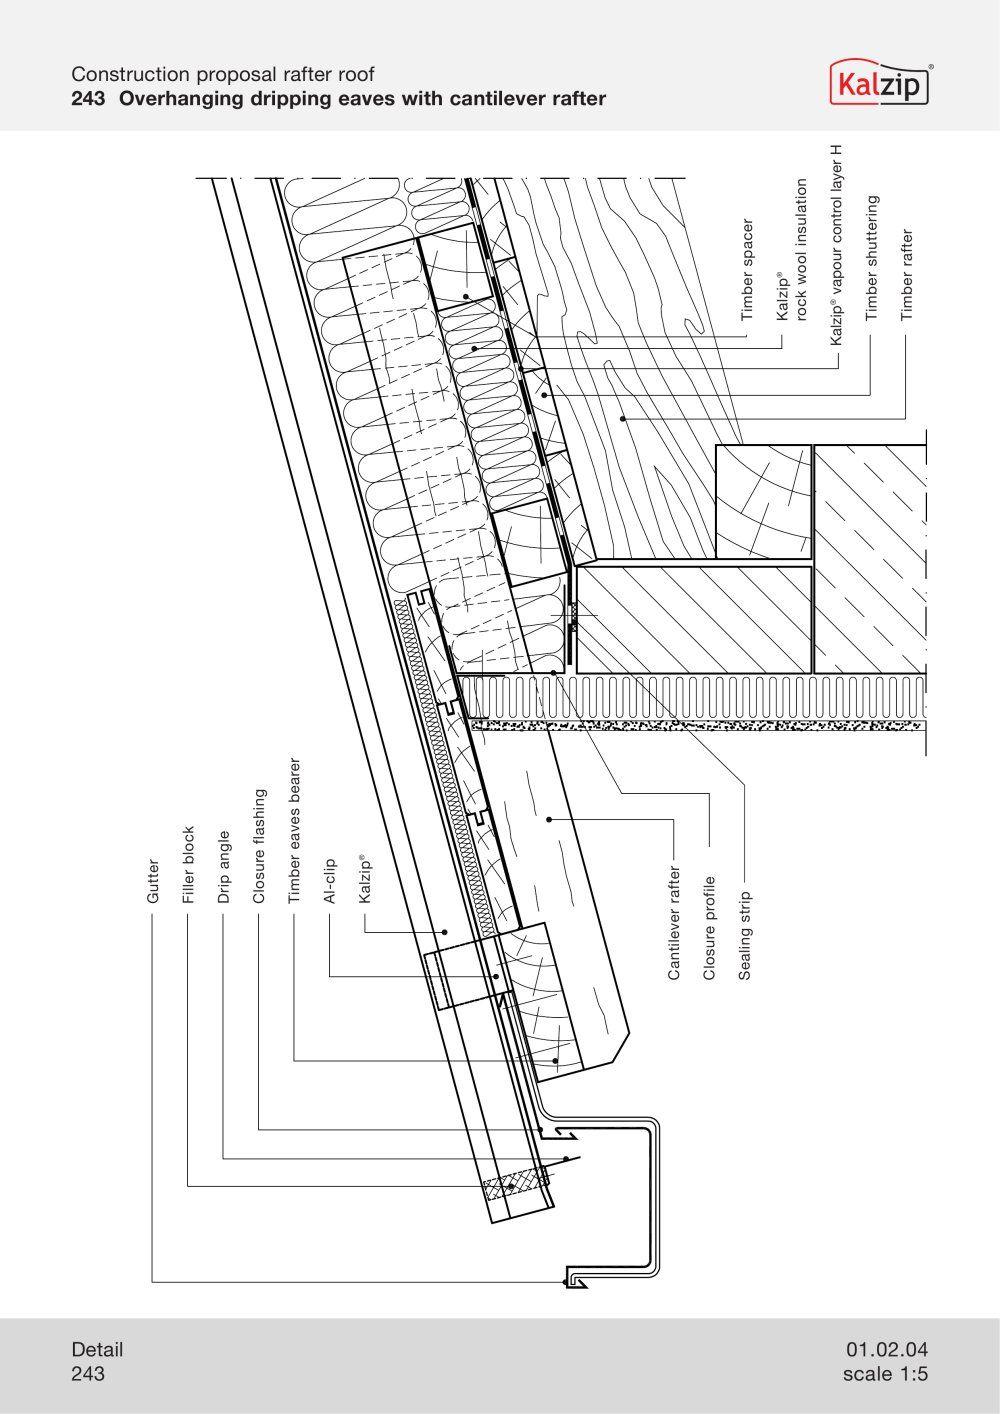 Kalzip Construction Details Archiexpo Rock Wool Insulation Detail Aluminum Roof